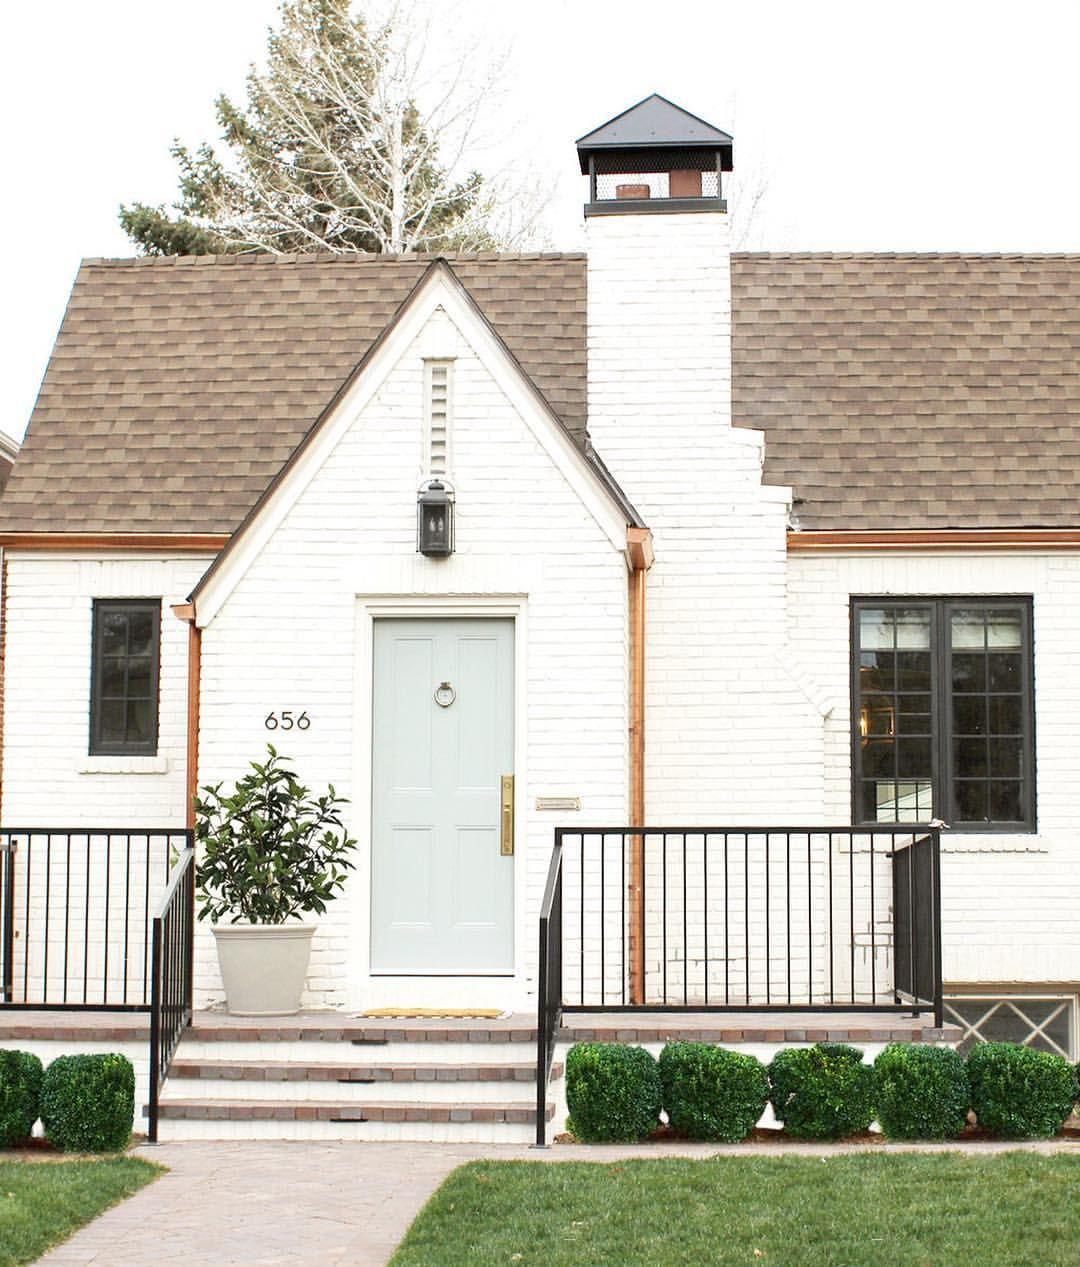 Pin By Brenda Br On E X T E R I O R White Brick Houses Exterior Brick Exterior House Colors